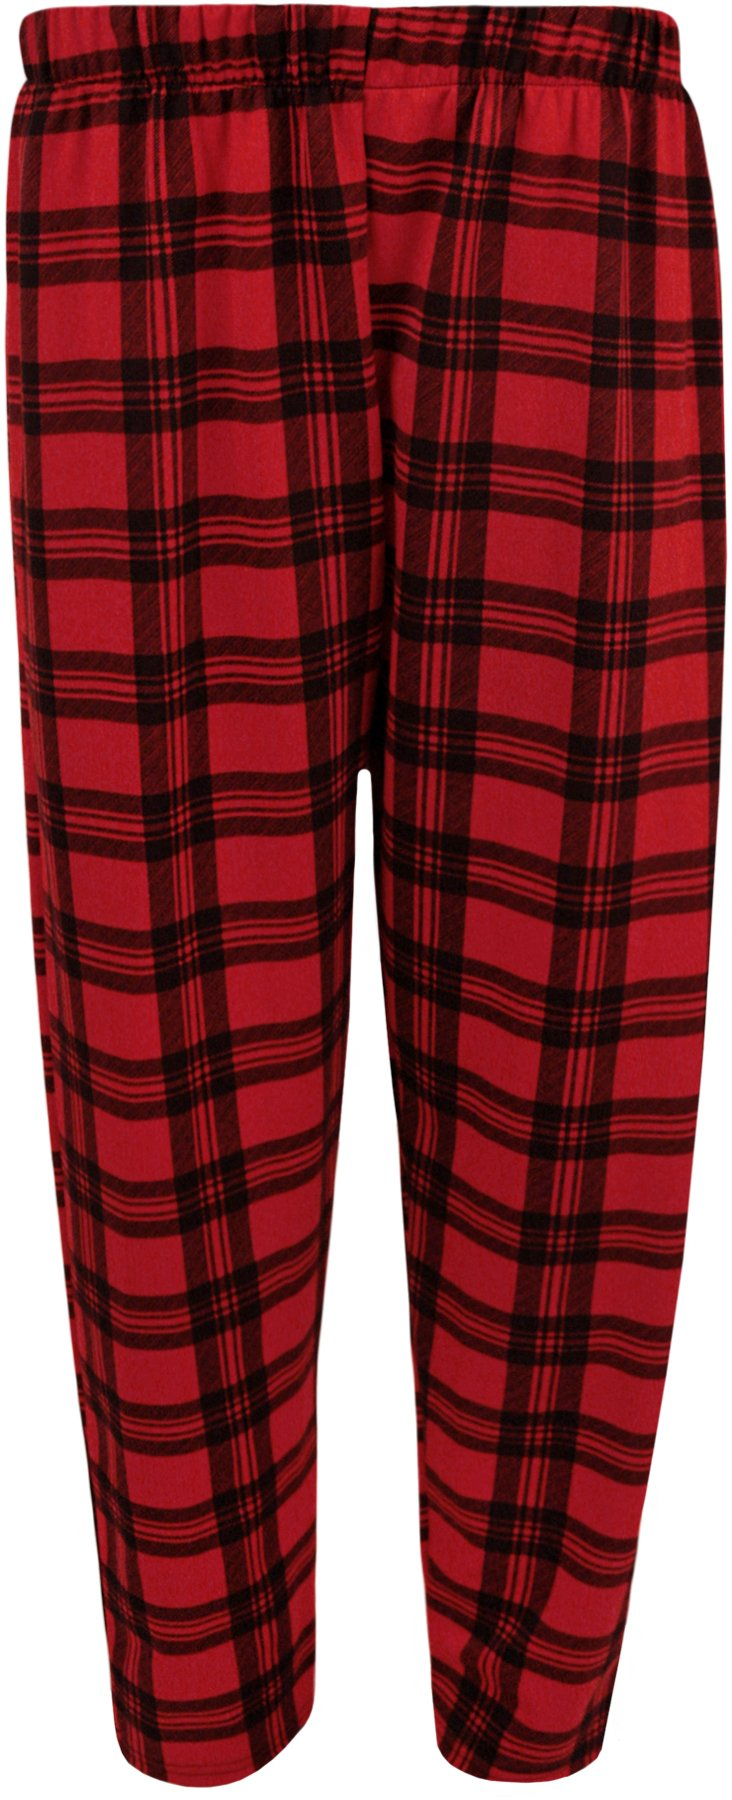 WearAll Women's Women's Plus Size Tartan Check Print Elastic Waist Ladies Long Pants - Red - US 16 (UK 20)